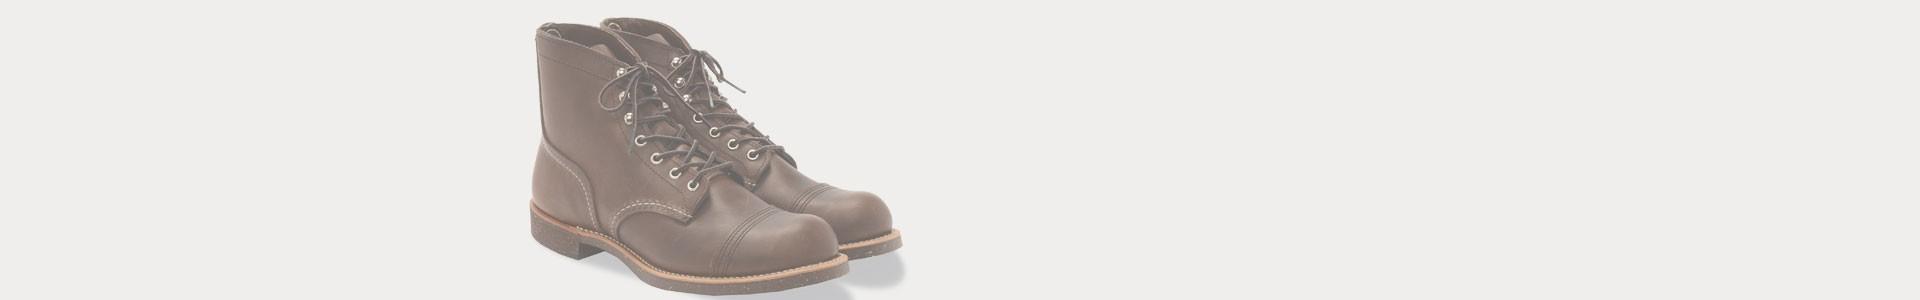 Botas para Hombre online | Compra en AnyGivenSunday.Shop